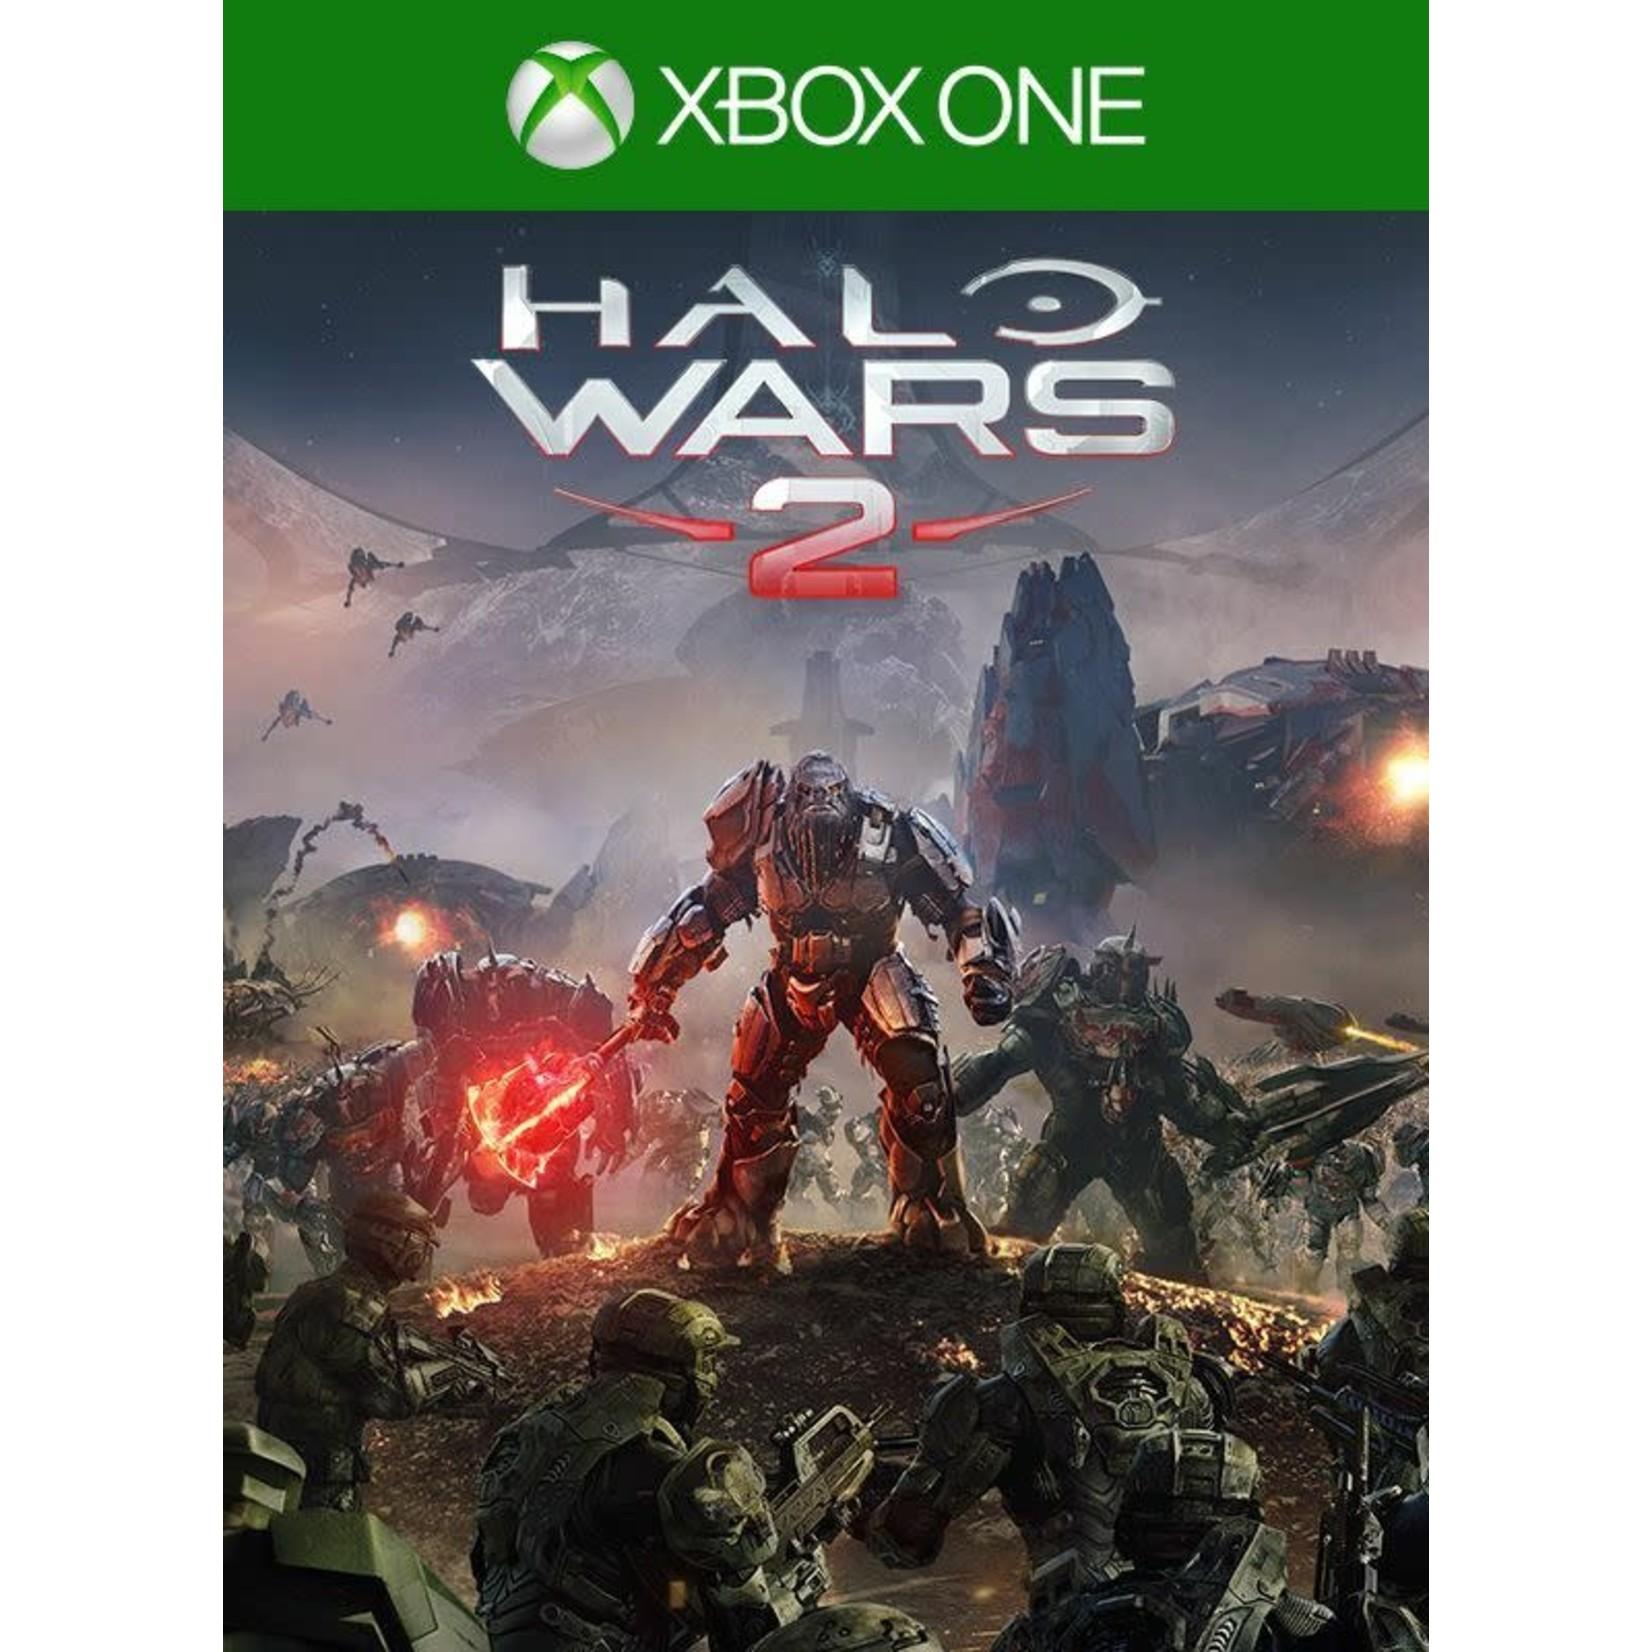 XB1-Halo Wars 2